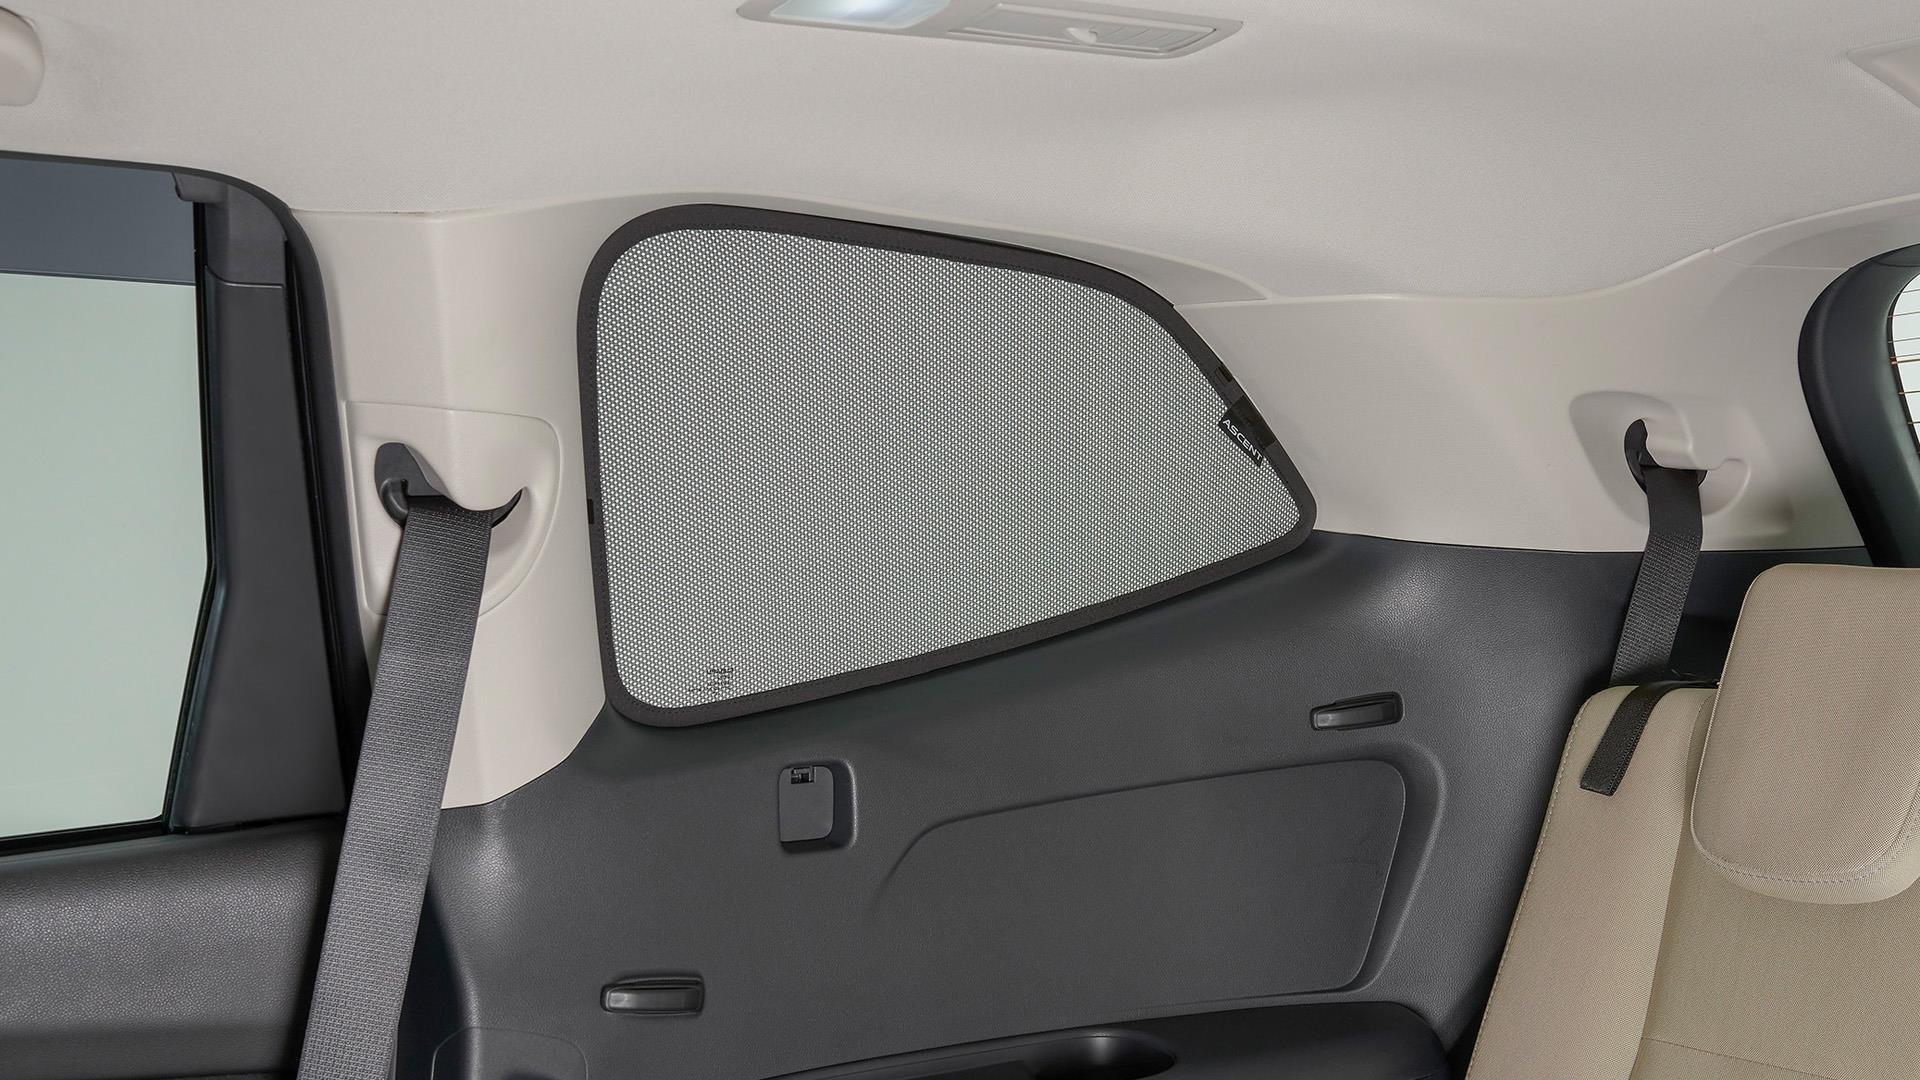 SUBARU 2019 Ascent 3rd Row Window Sunshades Set of Two New F501SXC020 Genuine